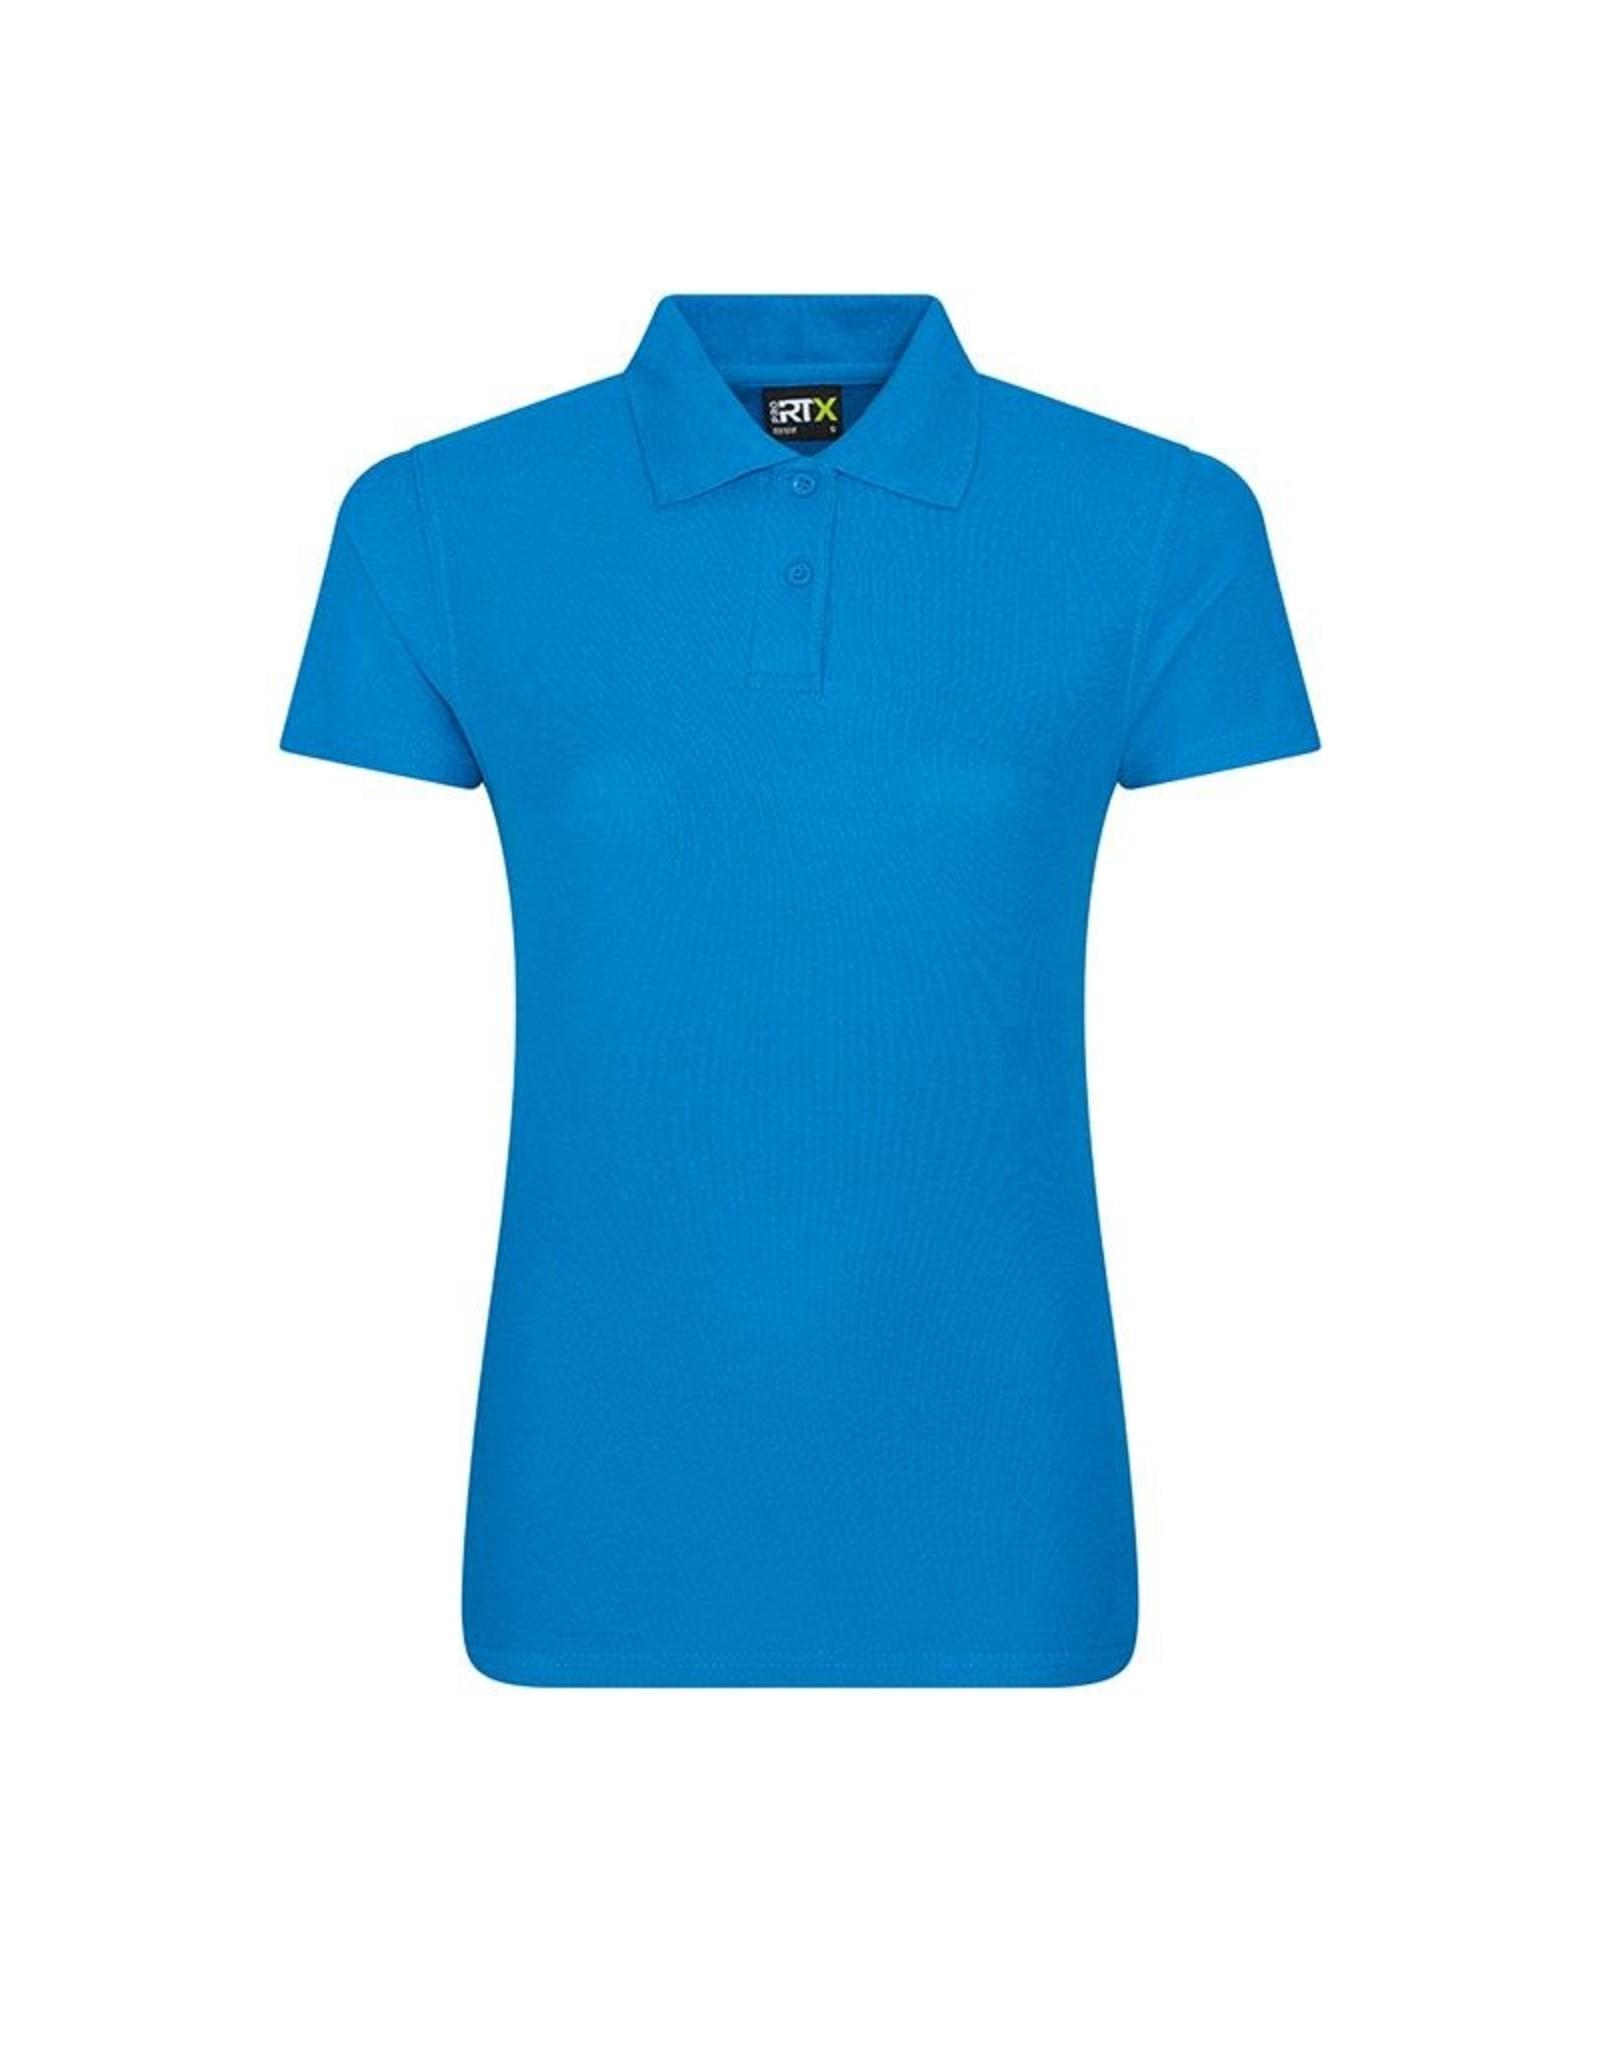 Pro RTX Dames POLOSHIRT piqué workwear atoll